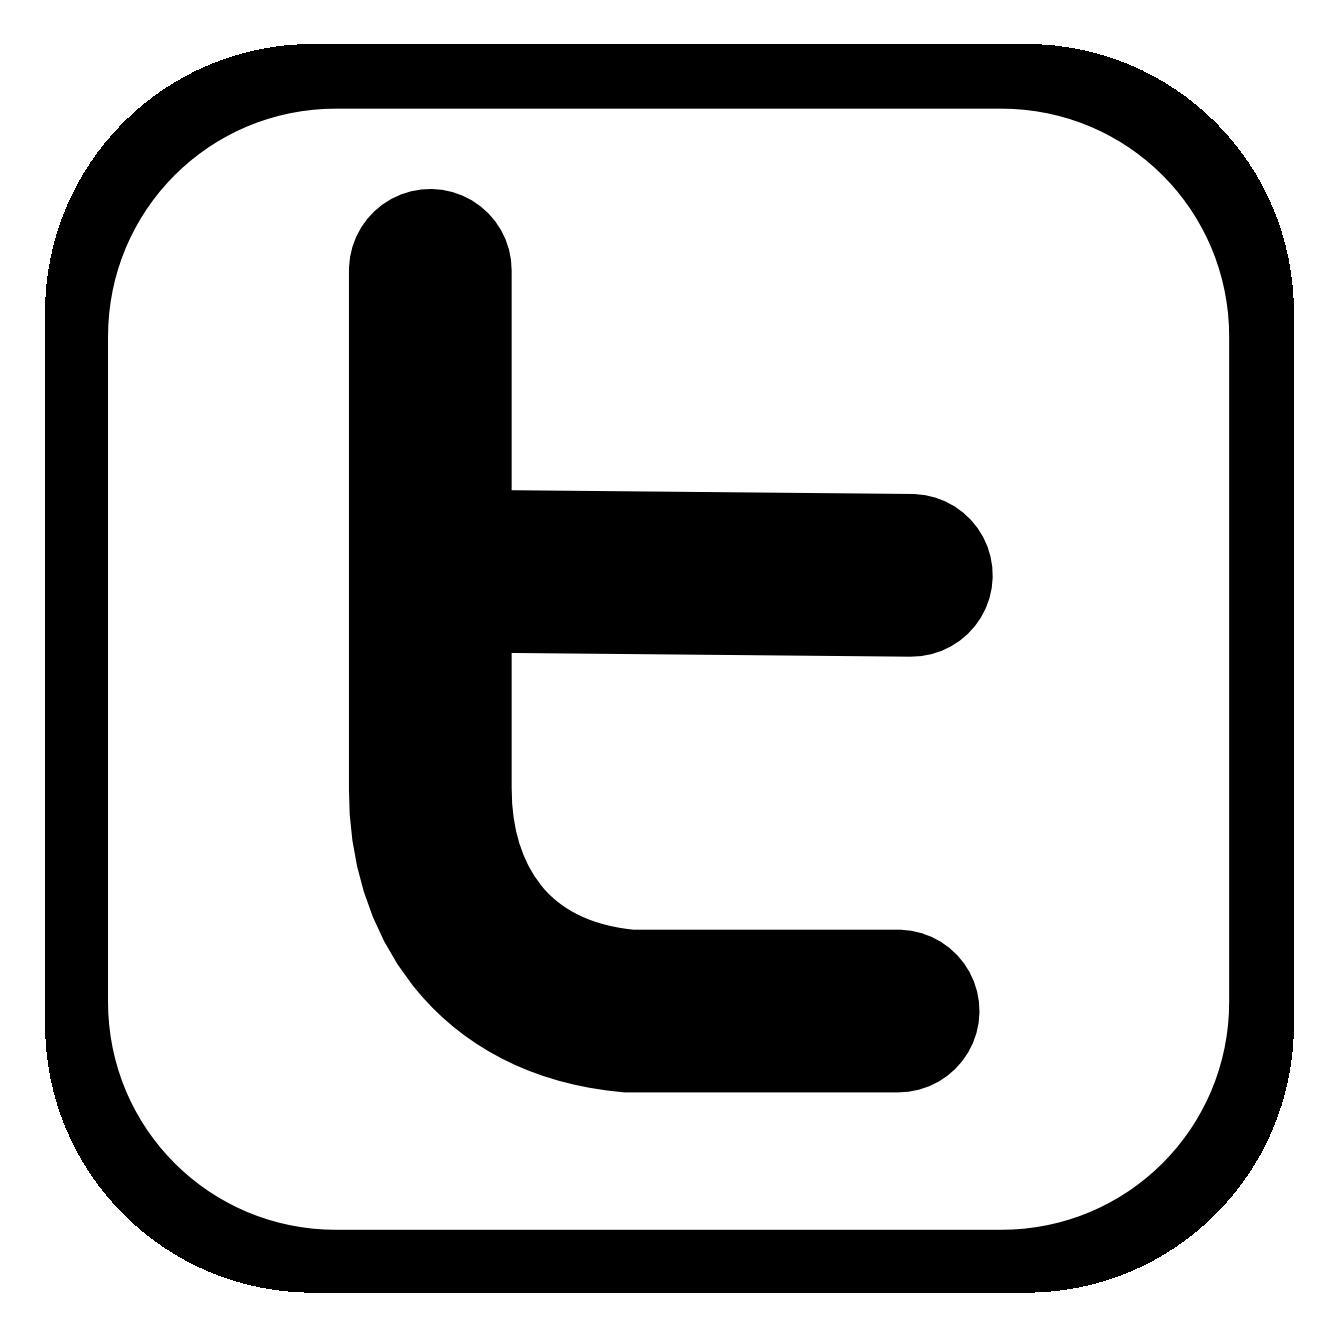 14 icons black circle background on twitter images